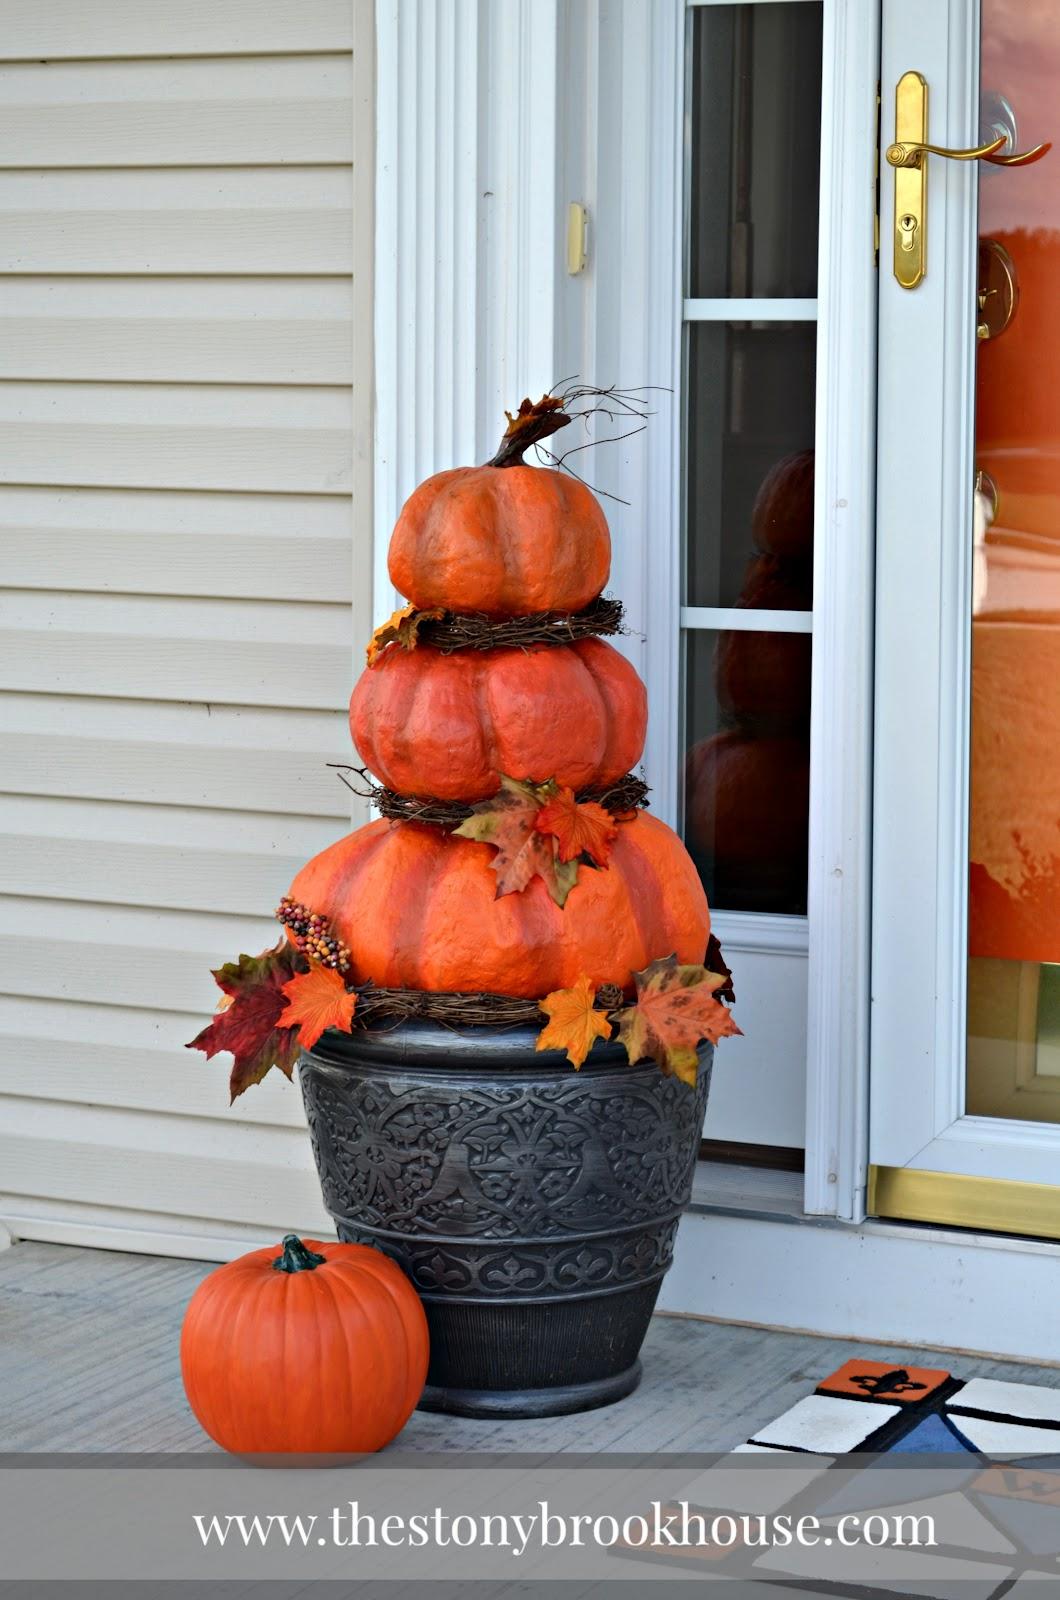 DIY Outdoor Real Looking Pumpkins - The Stonybrook House